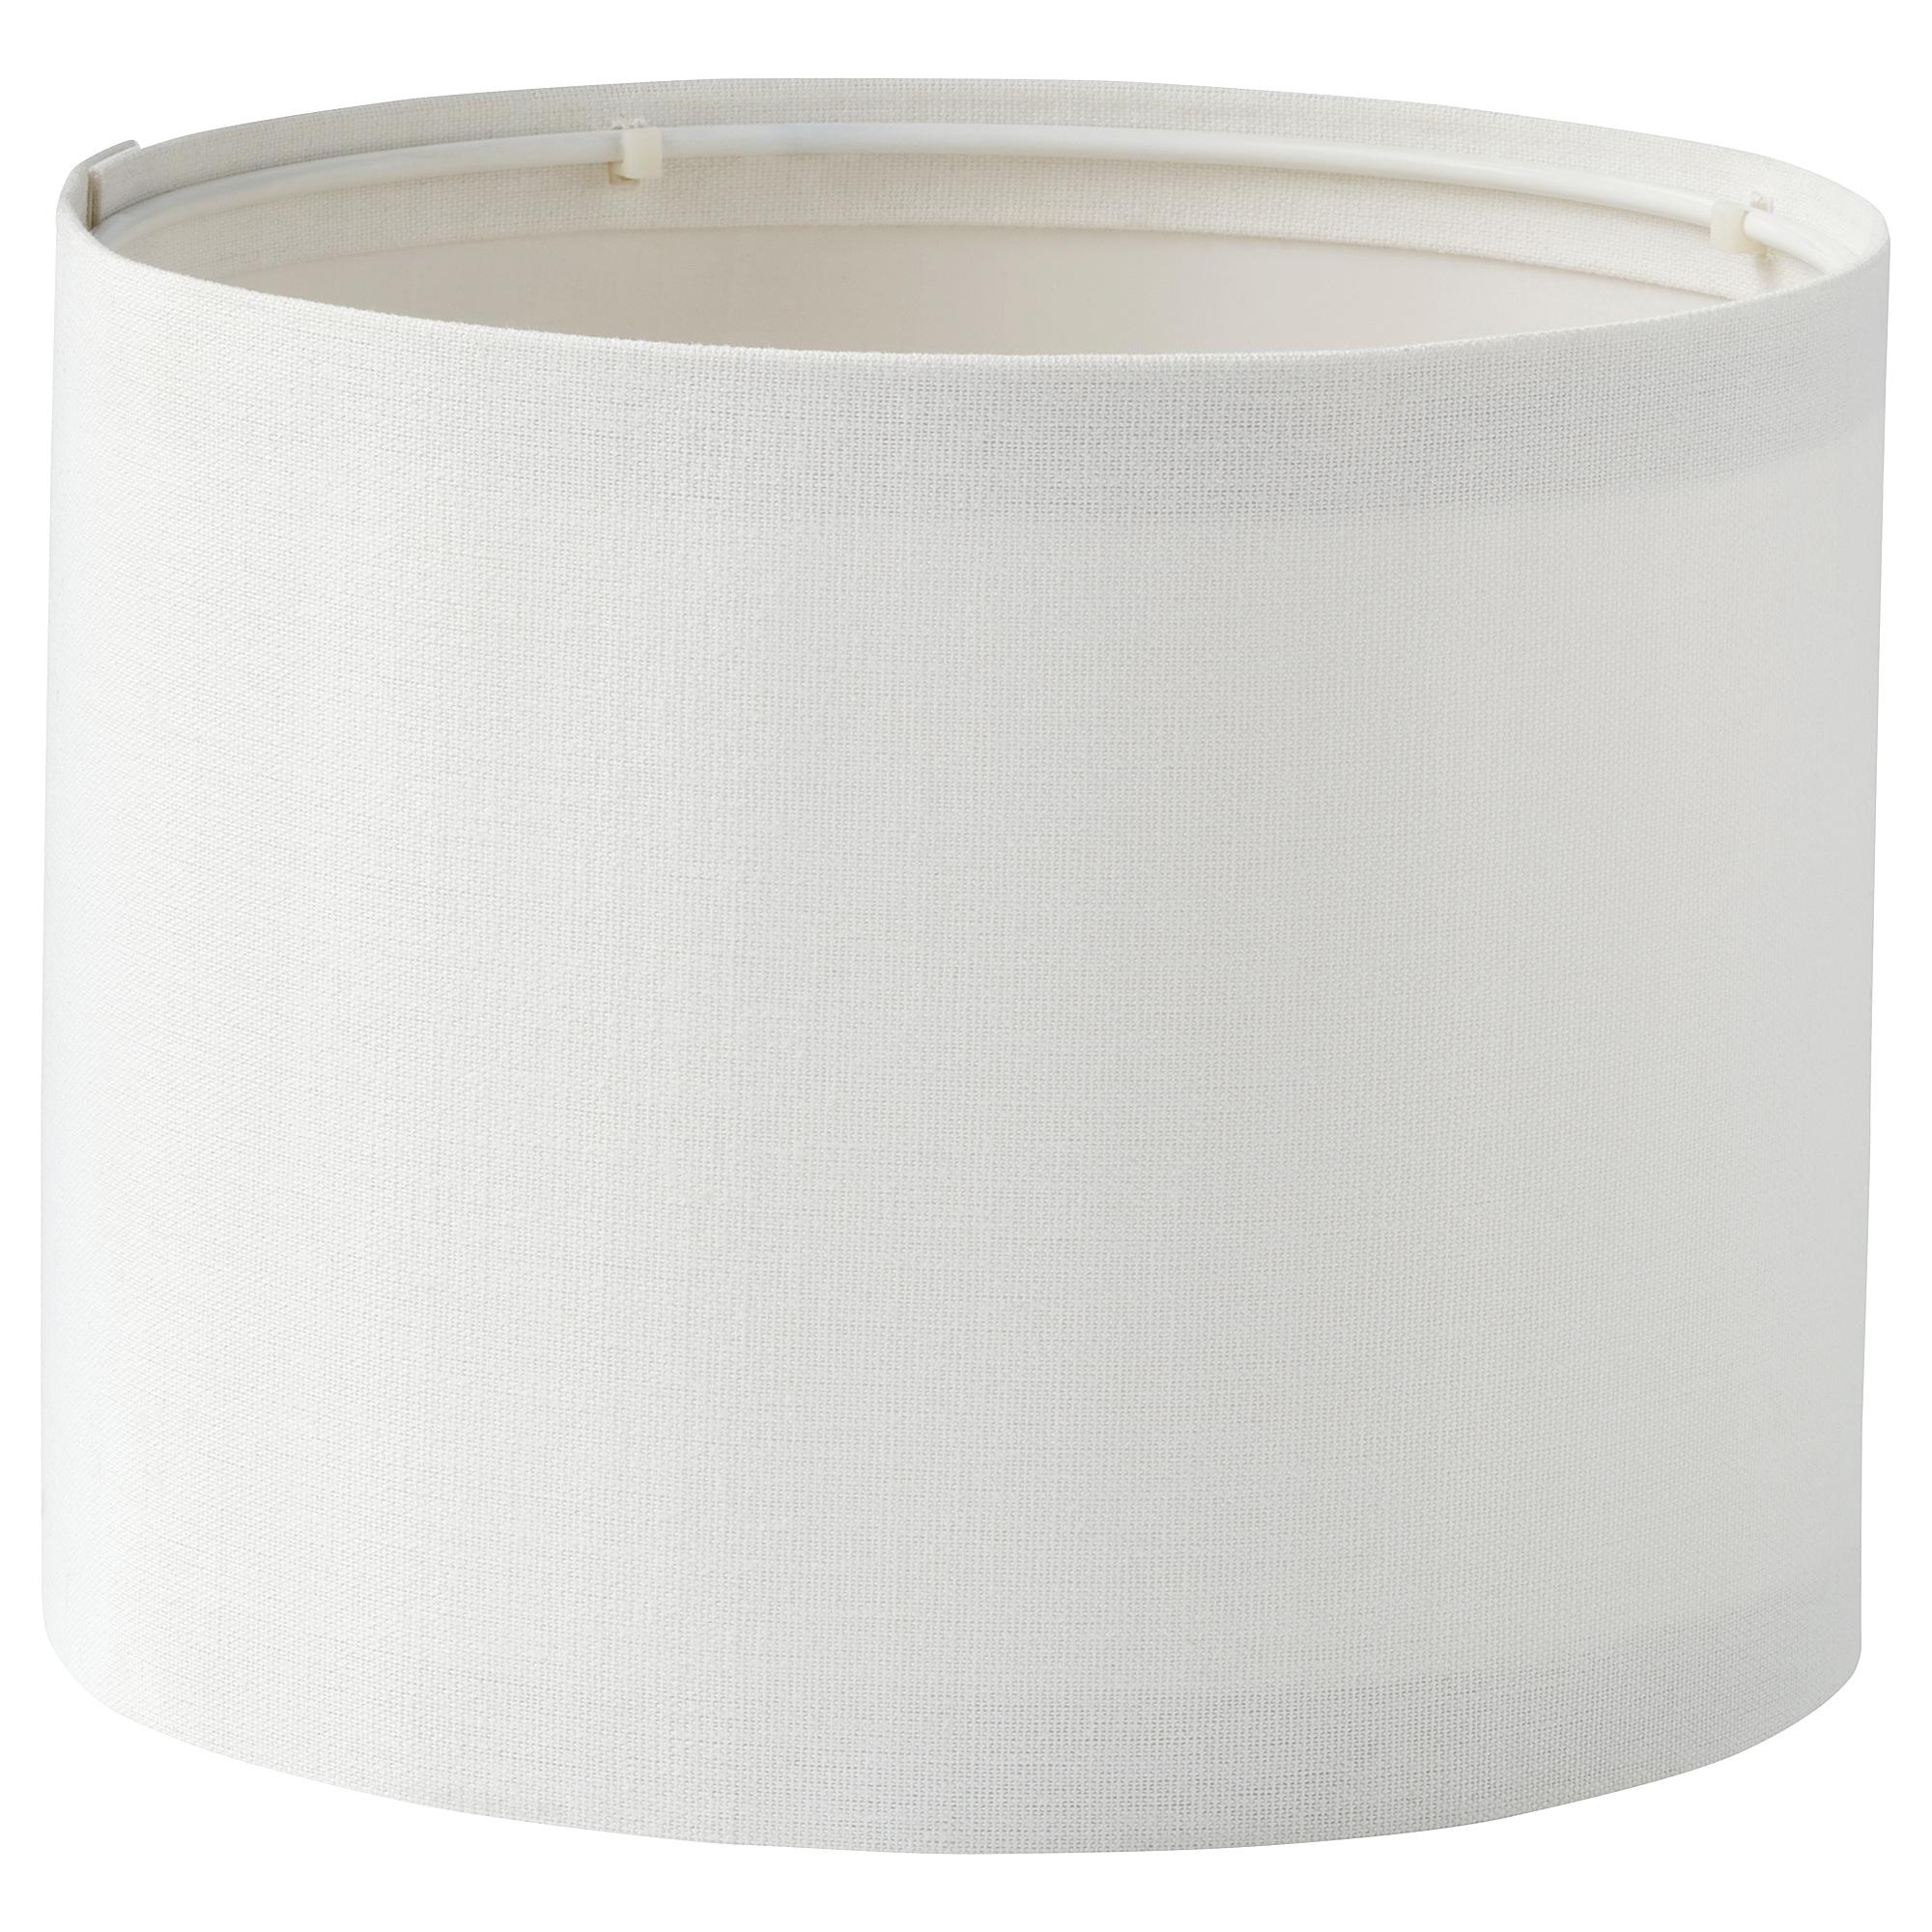 RINGSTA - 燈罩, 白色 | IKEA 香港及澳門